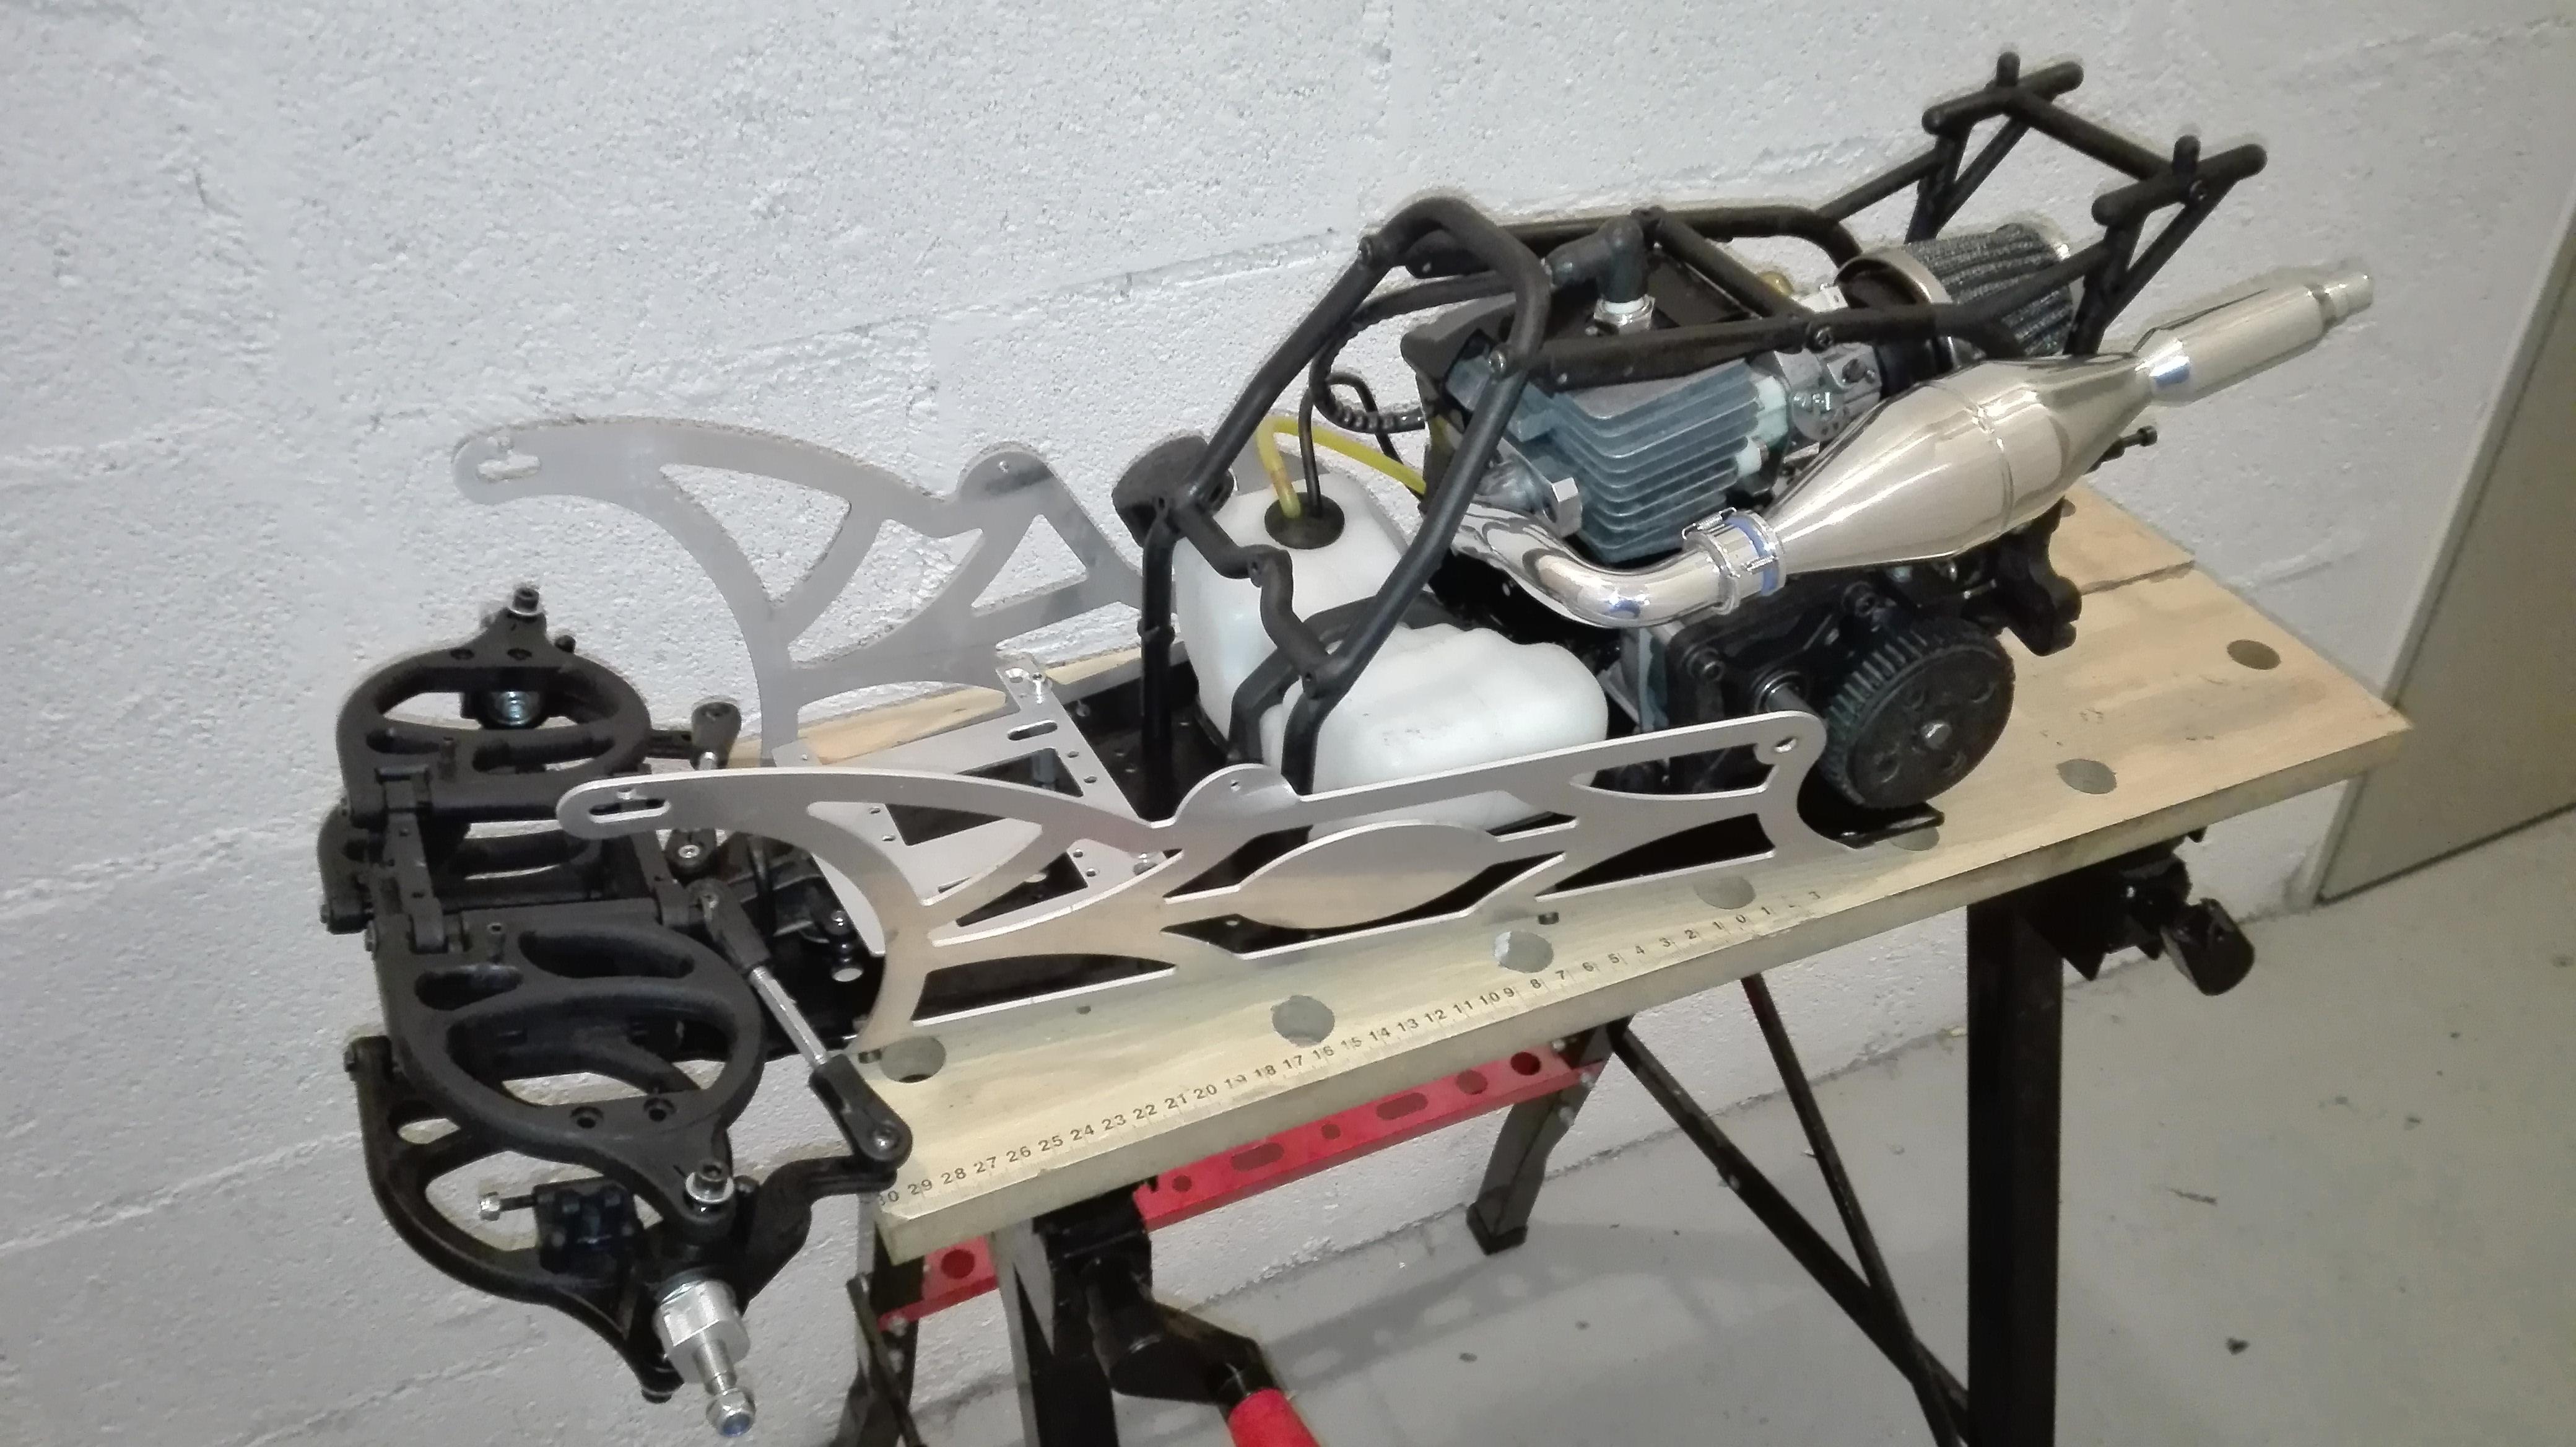 re-montage complet monster truck FG depuis un chassis nu - Page 2 180203080146931439